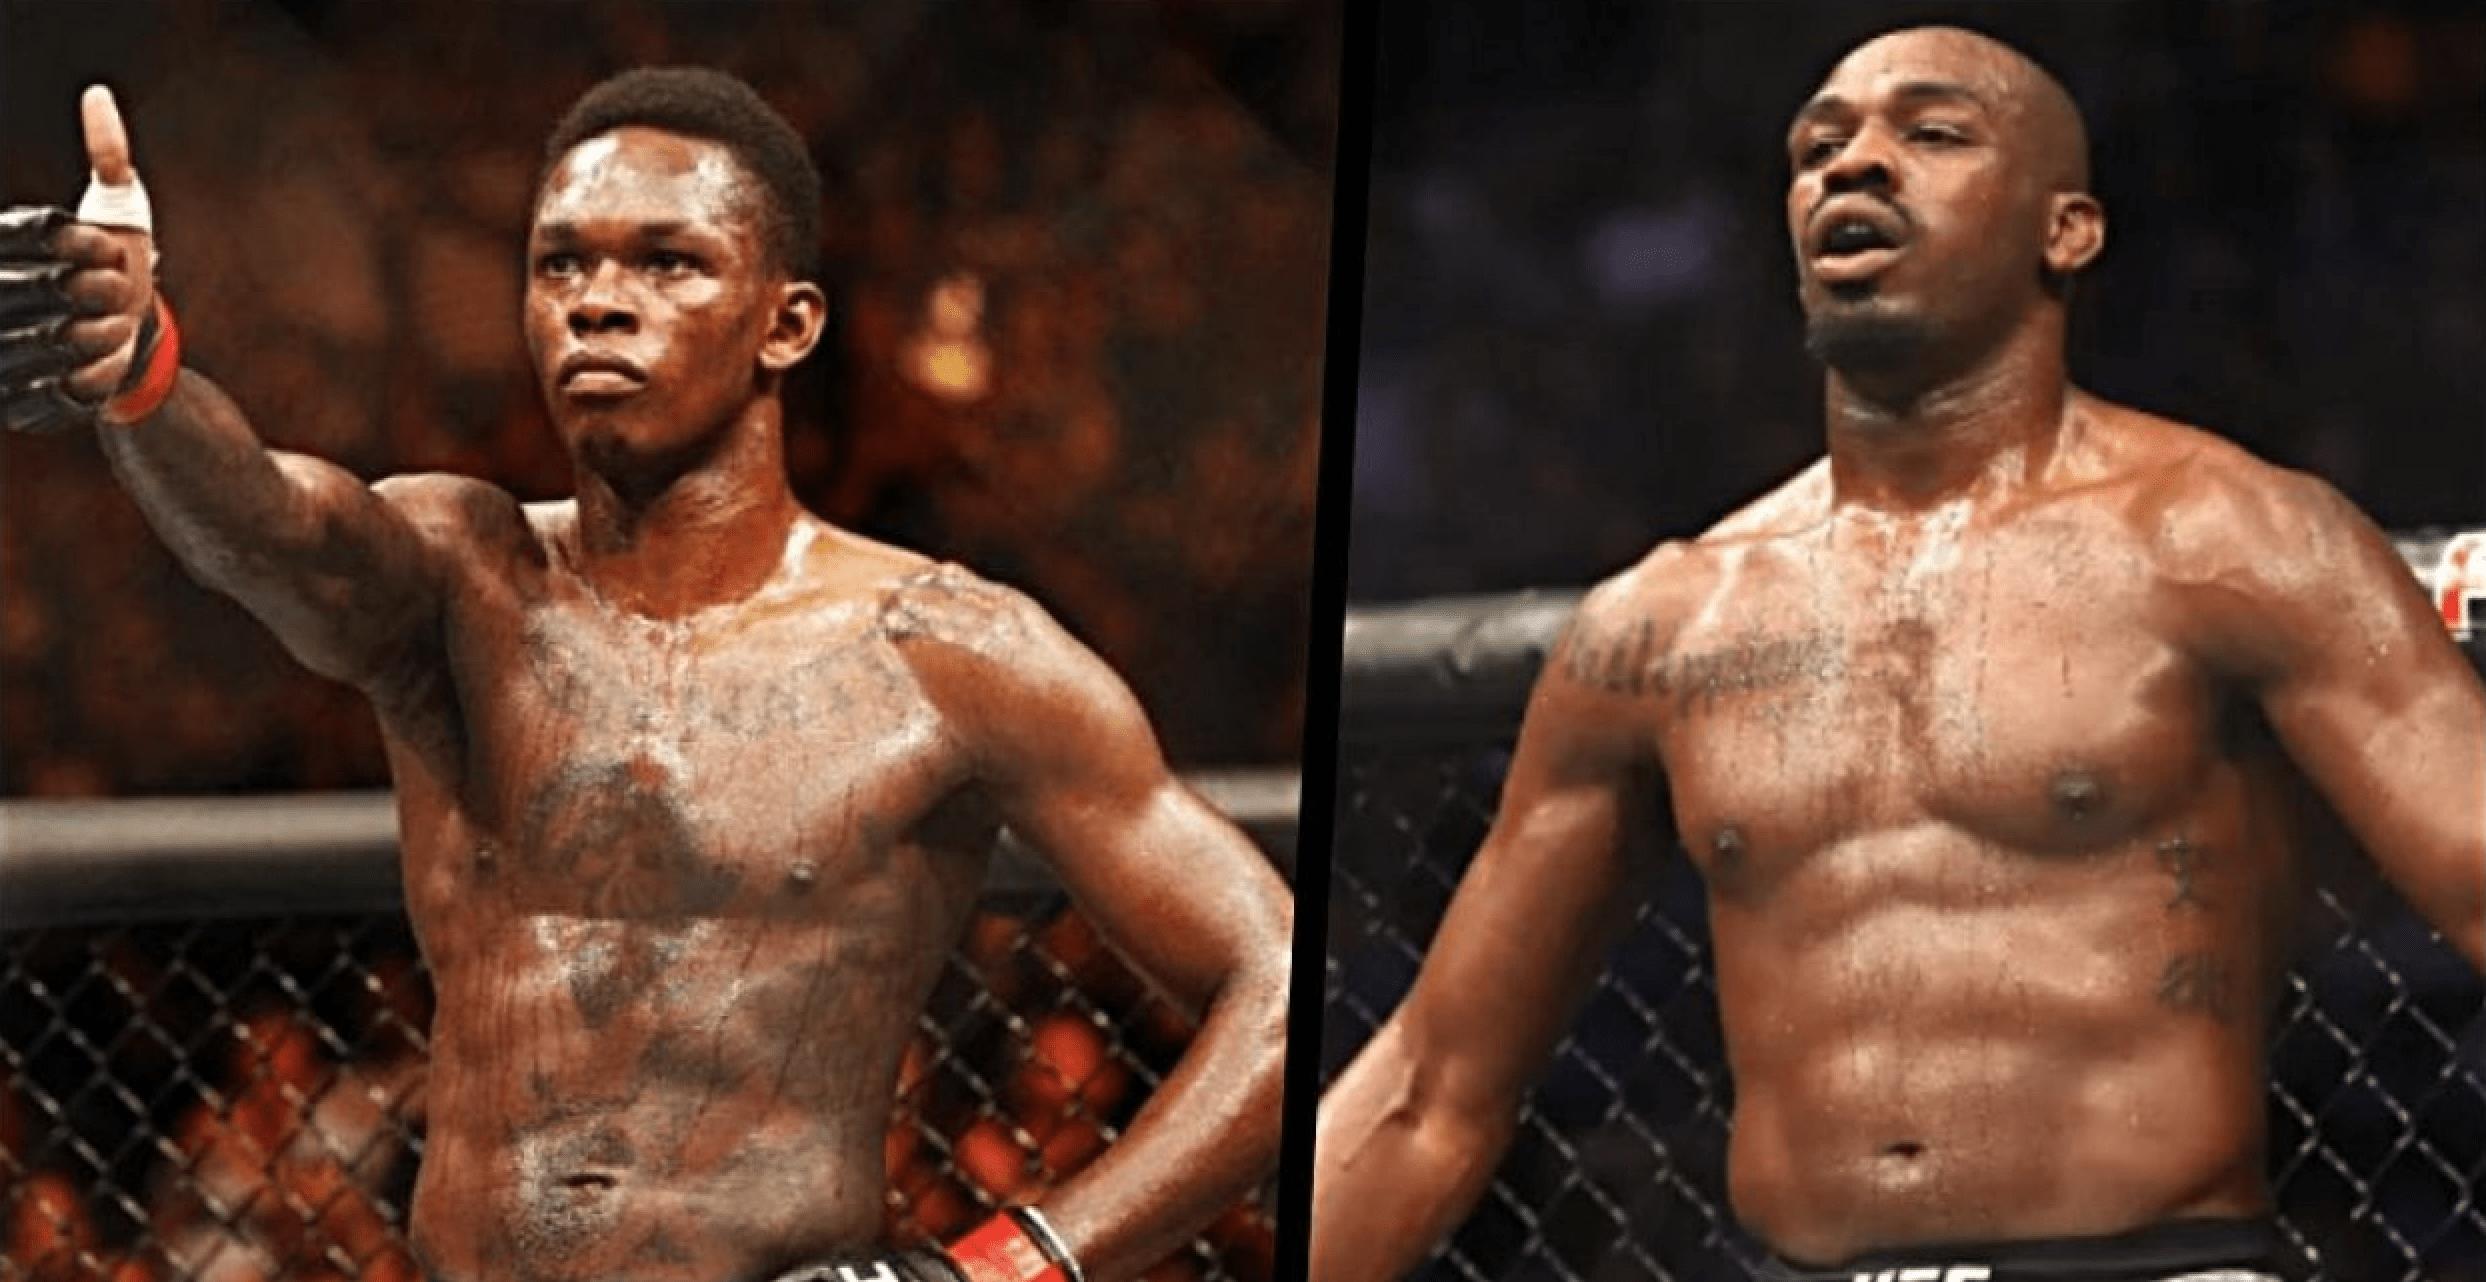 UFC: Israel Adesanya Is Coming For Jon Jones